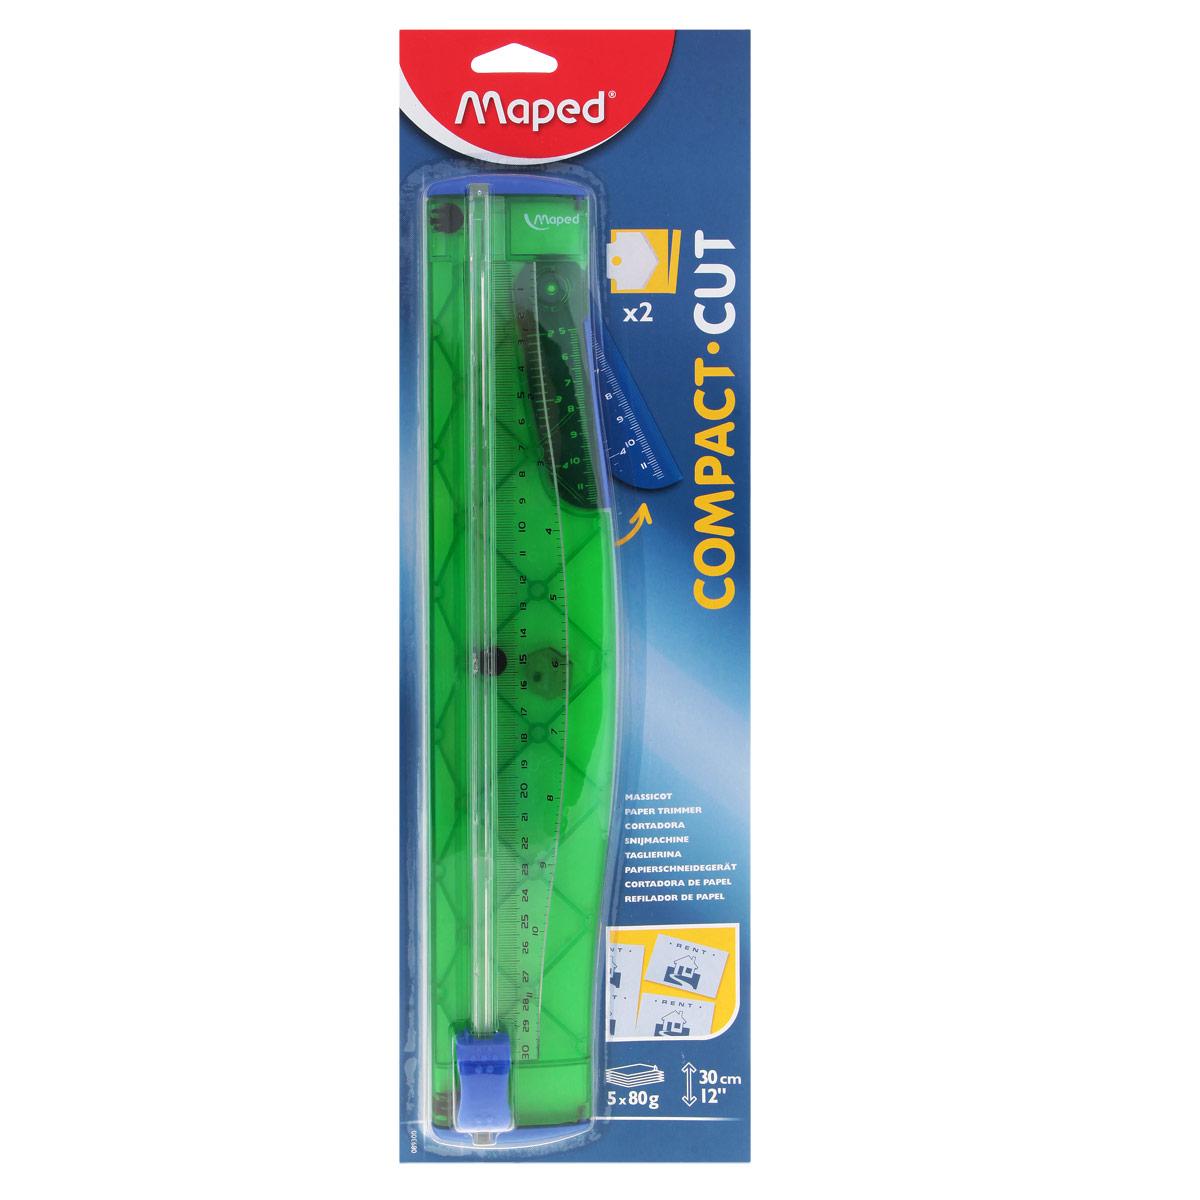 Мини-резак для бумаги Maped Compact, цвет: зеленый deli 8015 стальной резак резак резак резак 250 мм 250 мм